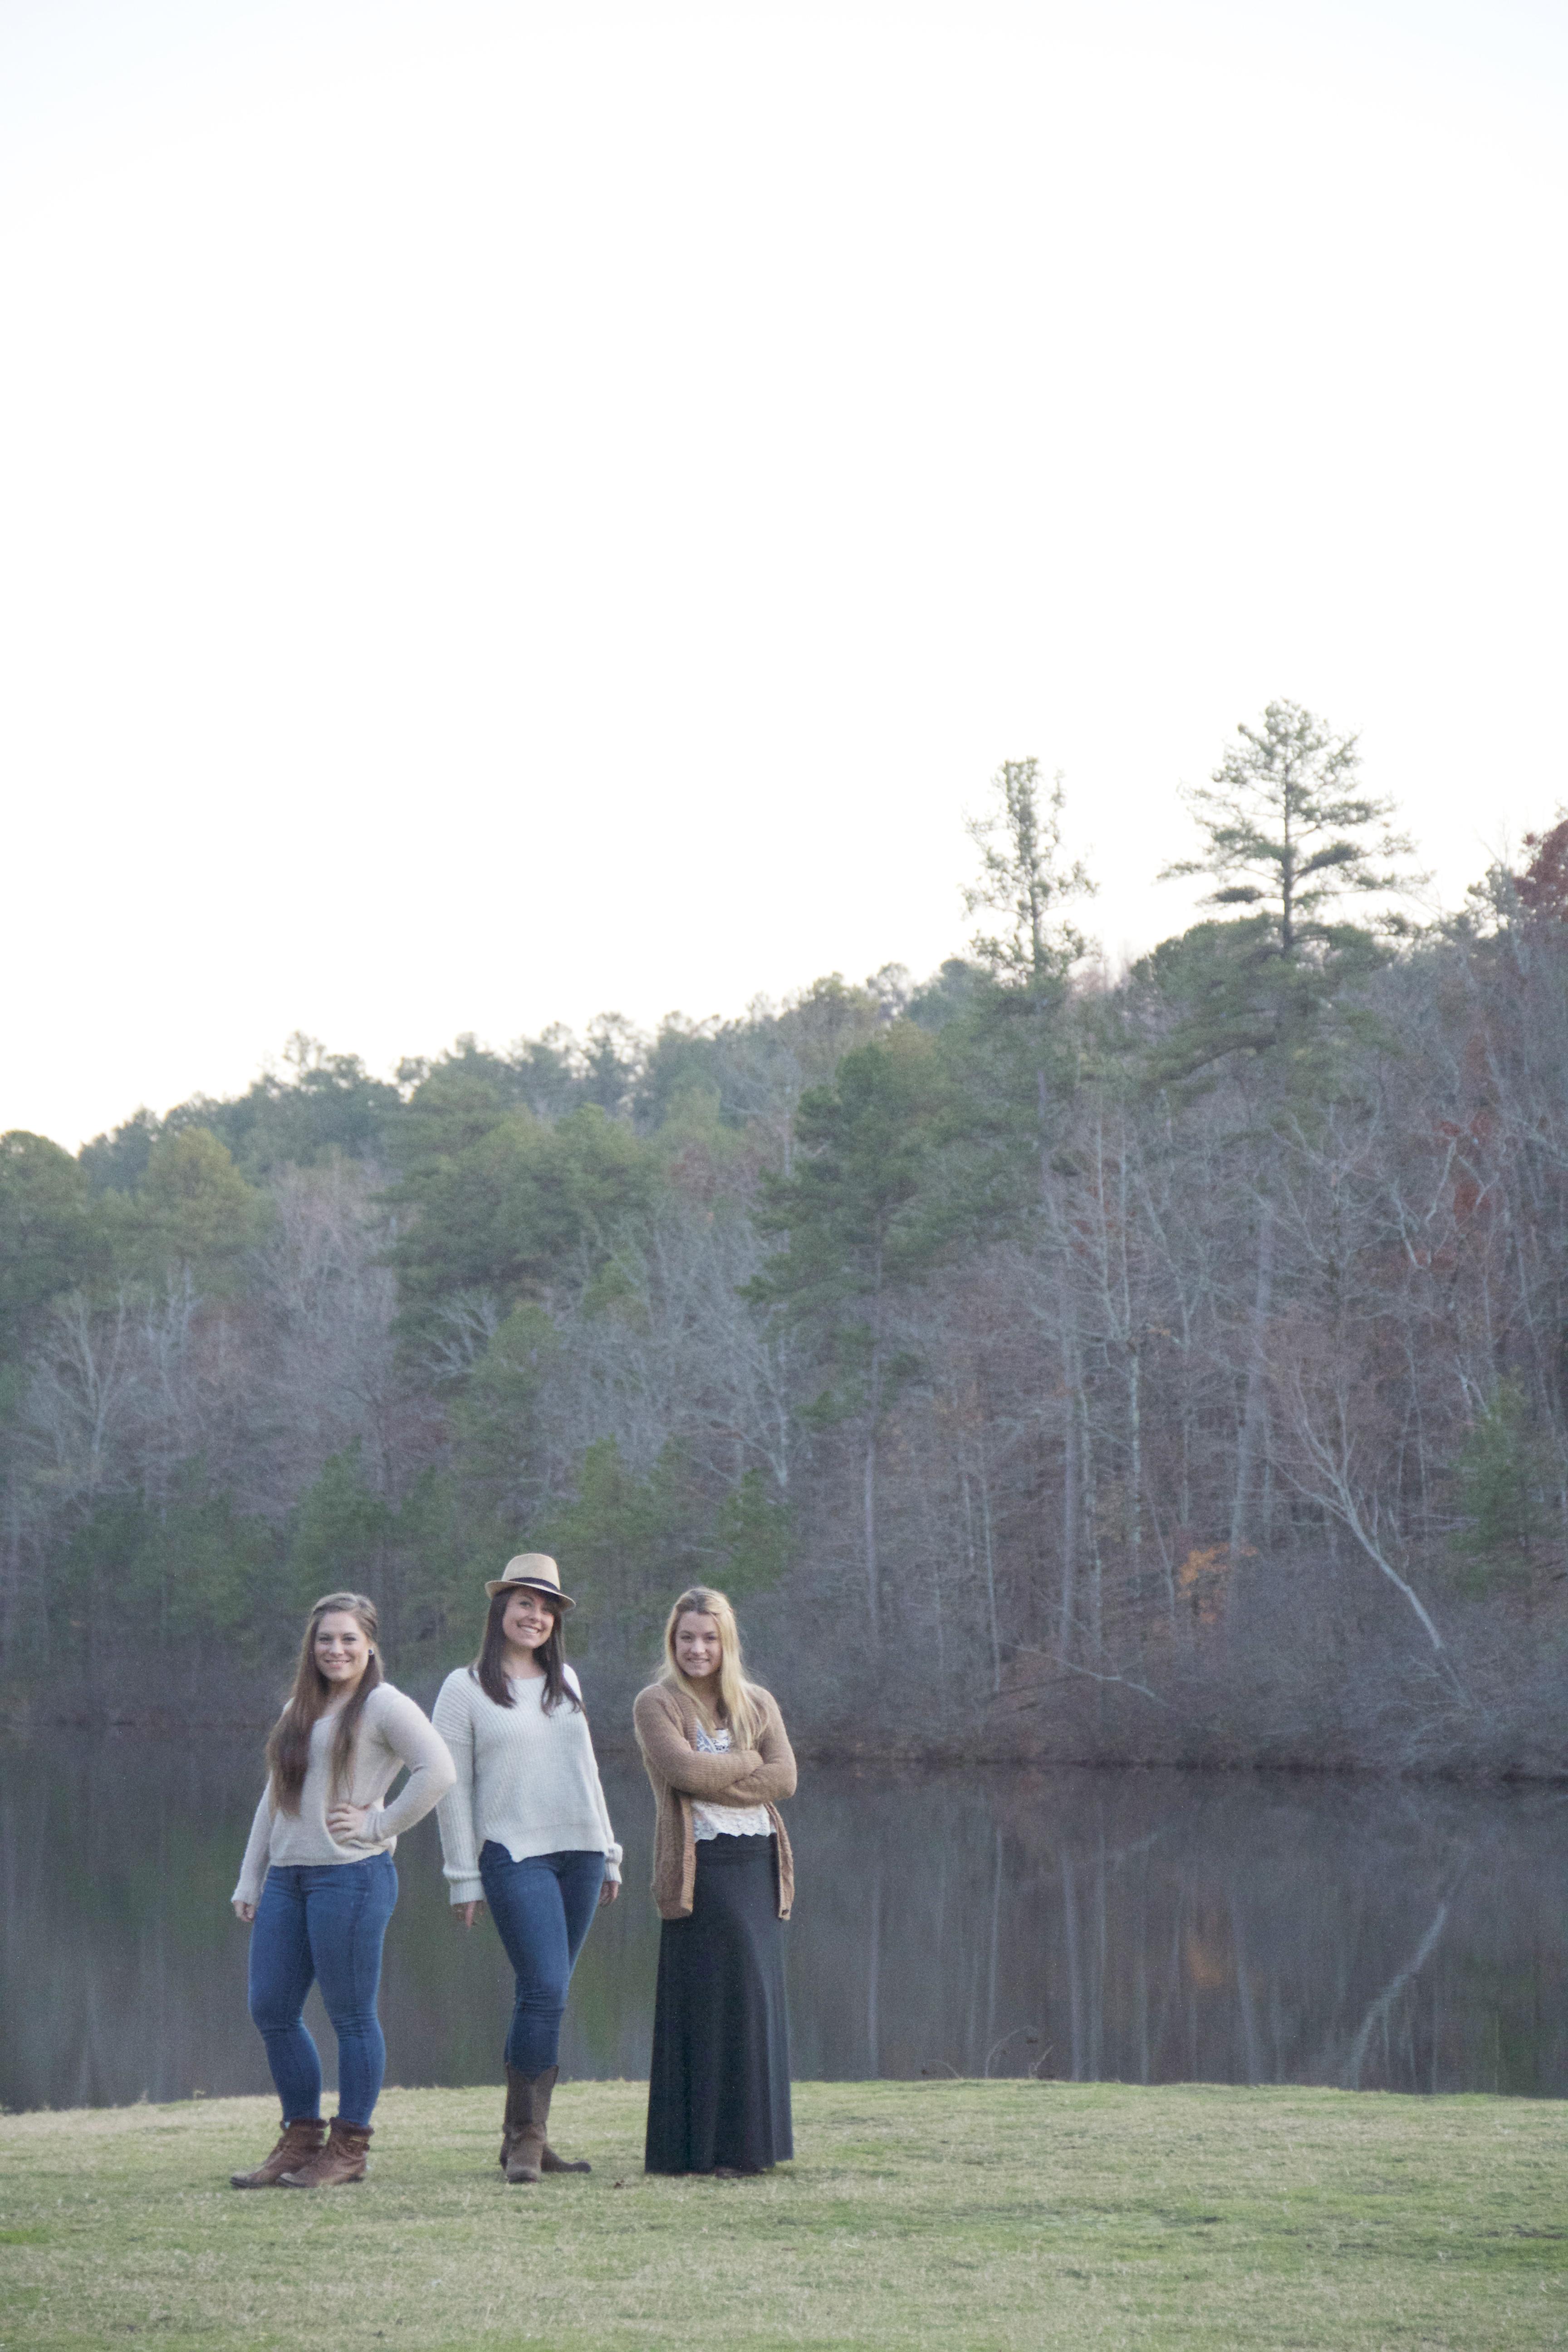 Sister shoot photographer on the lake photo